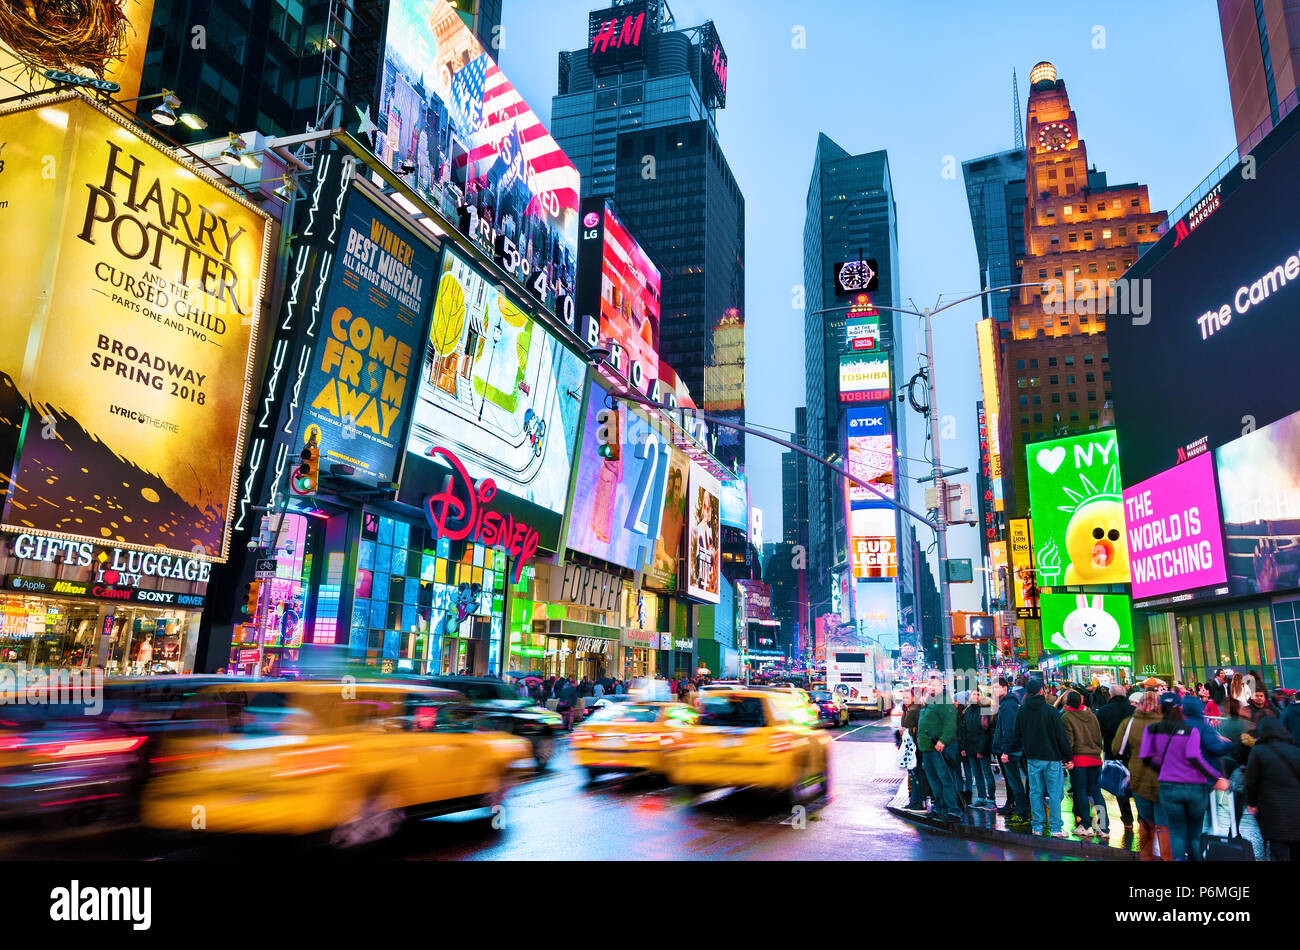 New York Times Square Lights Manhattan New York City Stock Photo